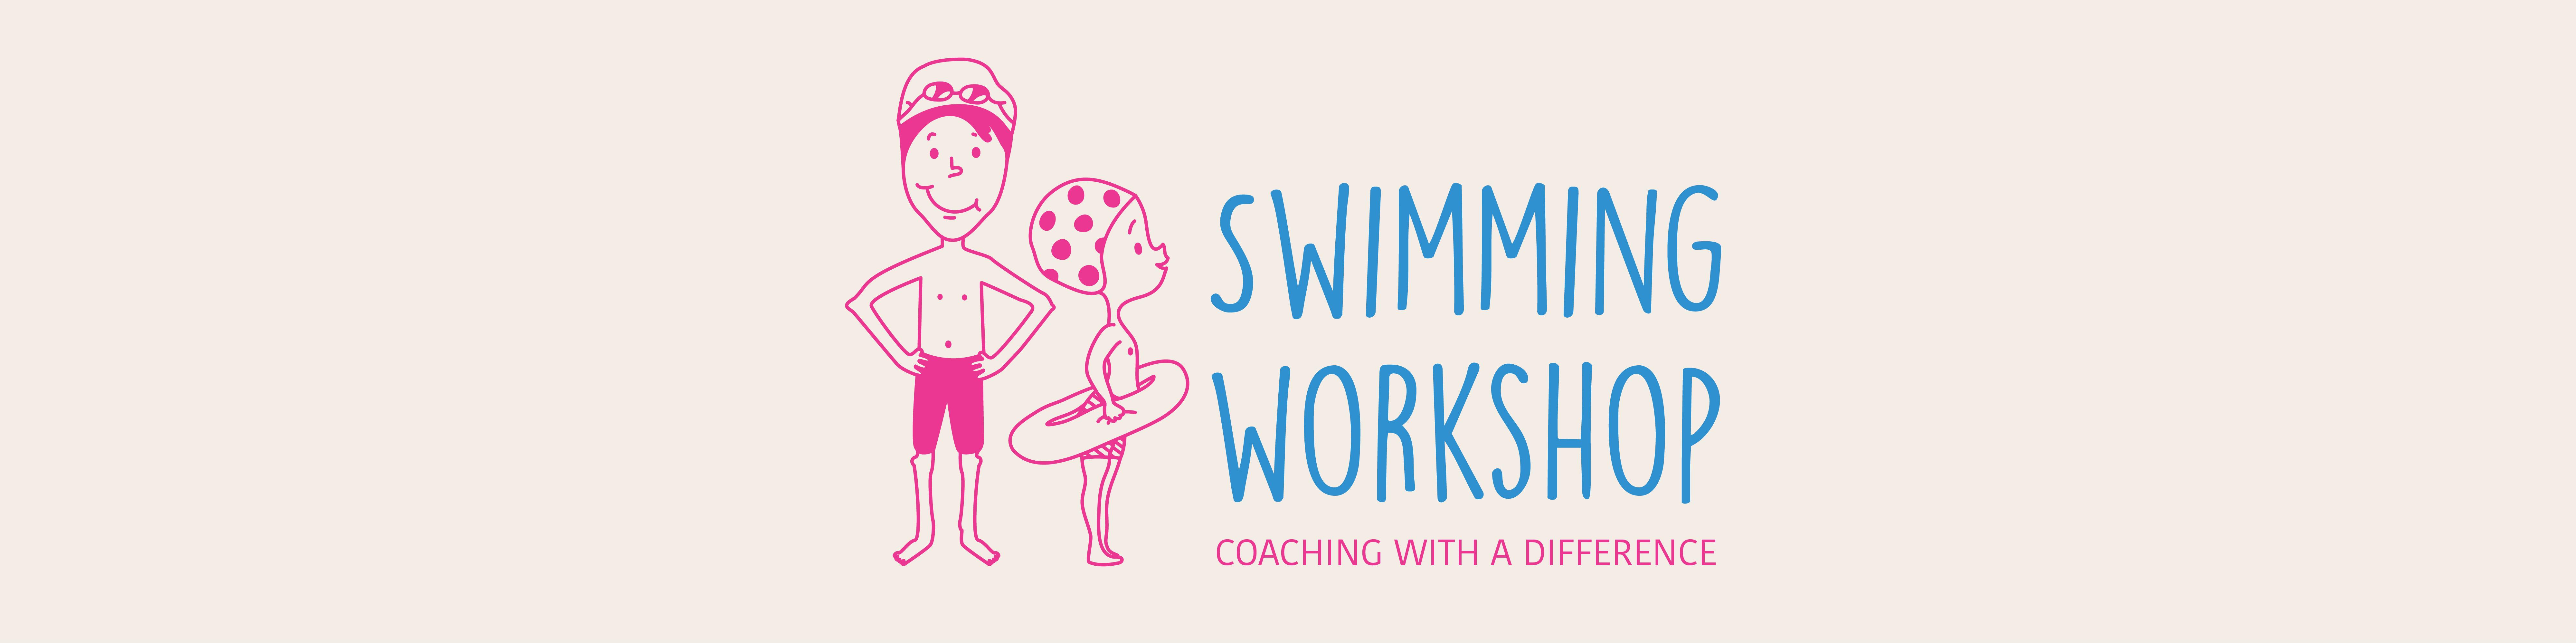 Swimming Workshop